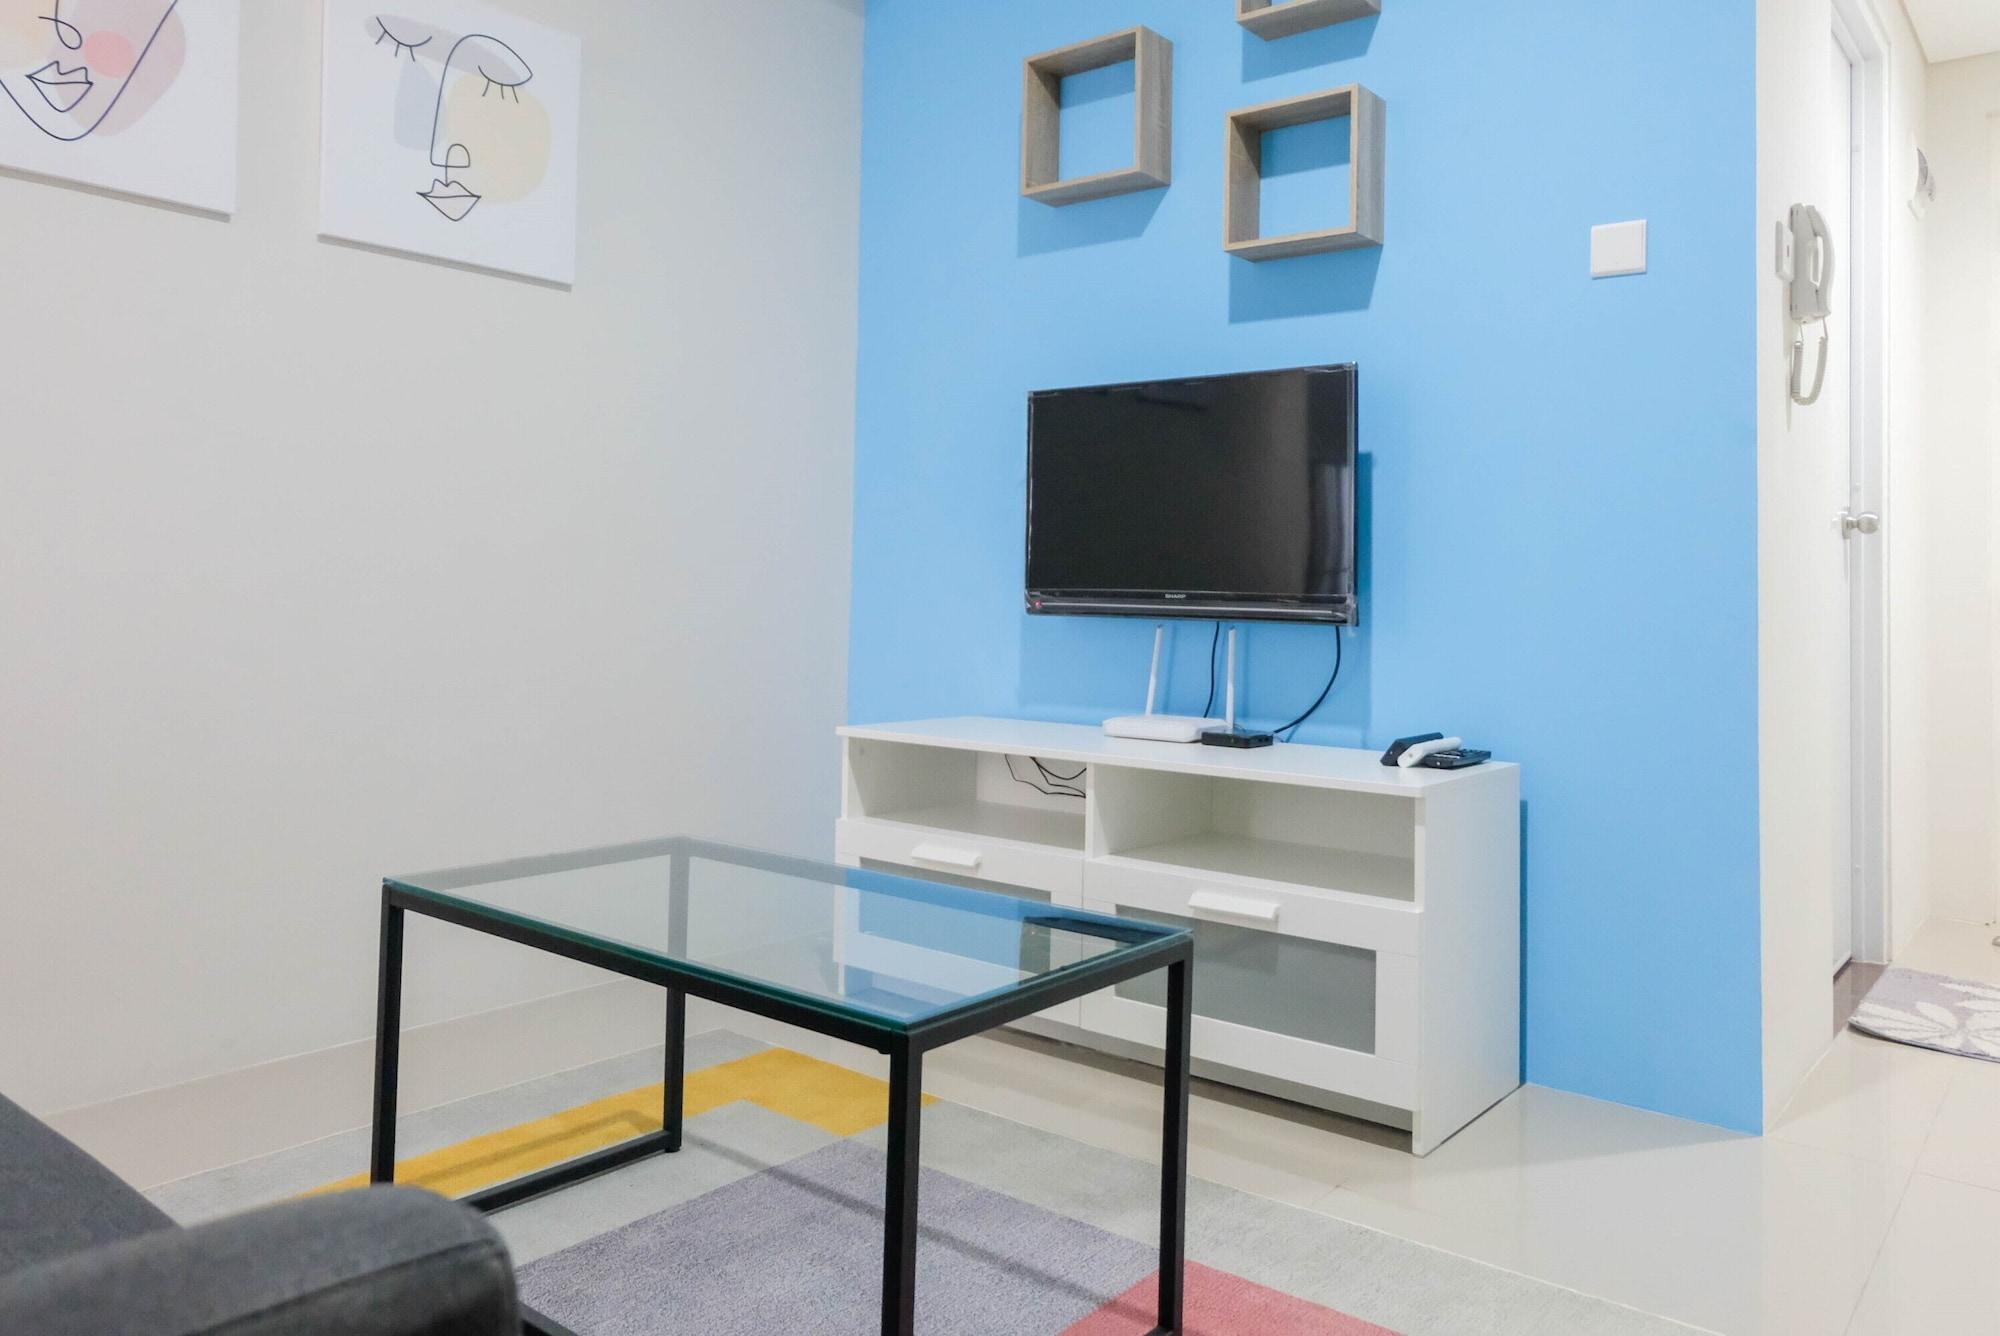 Minimalist and Convenient 1BR Bintaro Plaza Apartment, Tangerang Selatan